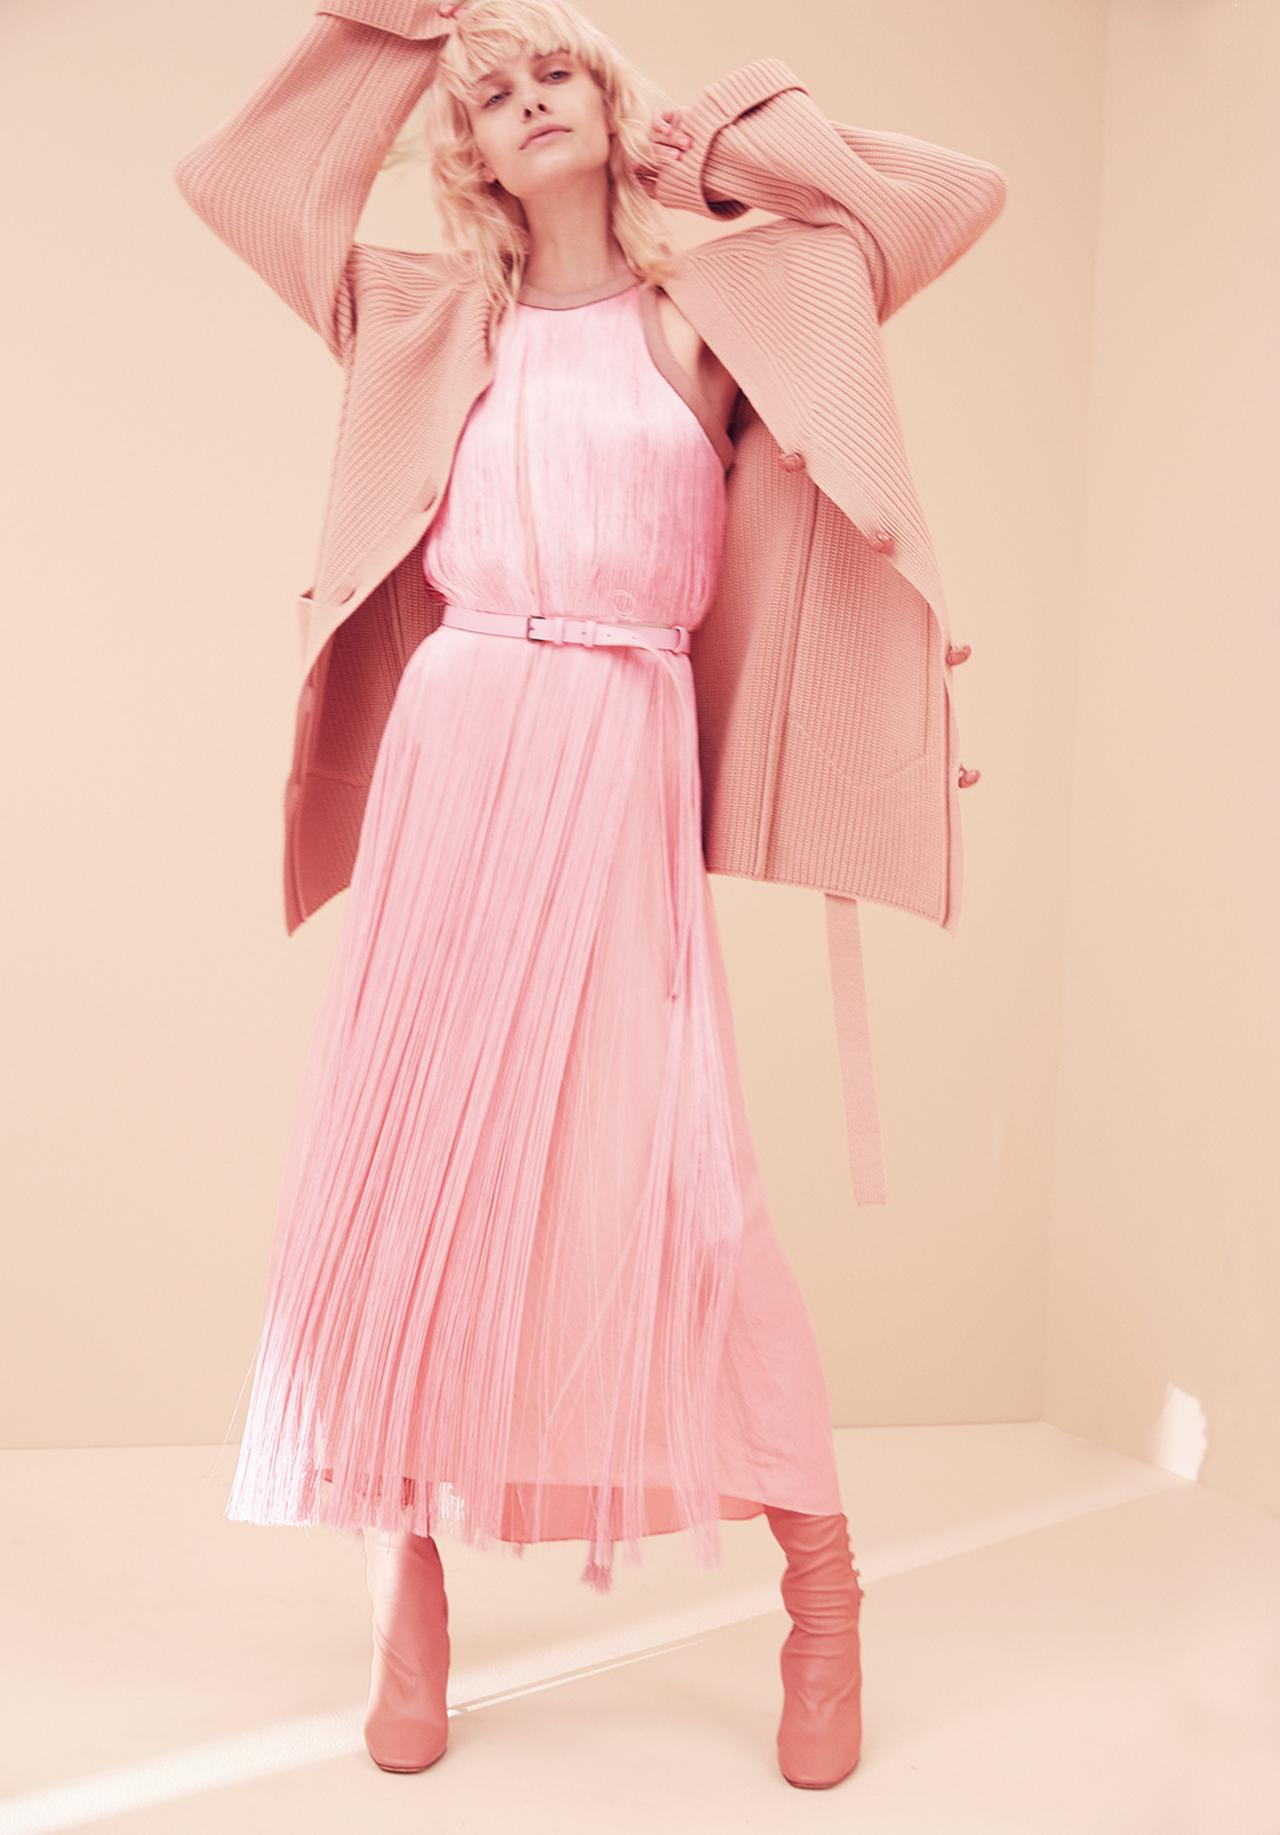 Images : 2番目の画像 - 「洗練のピンク」のアルバム - T JAPAN:The New York Times Style Magazine 公式サイト